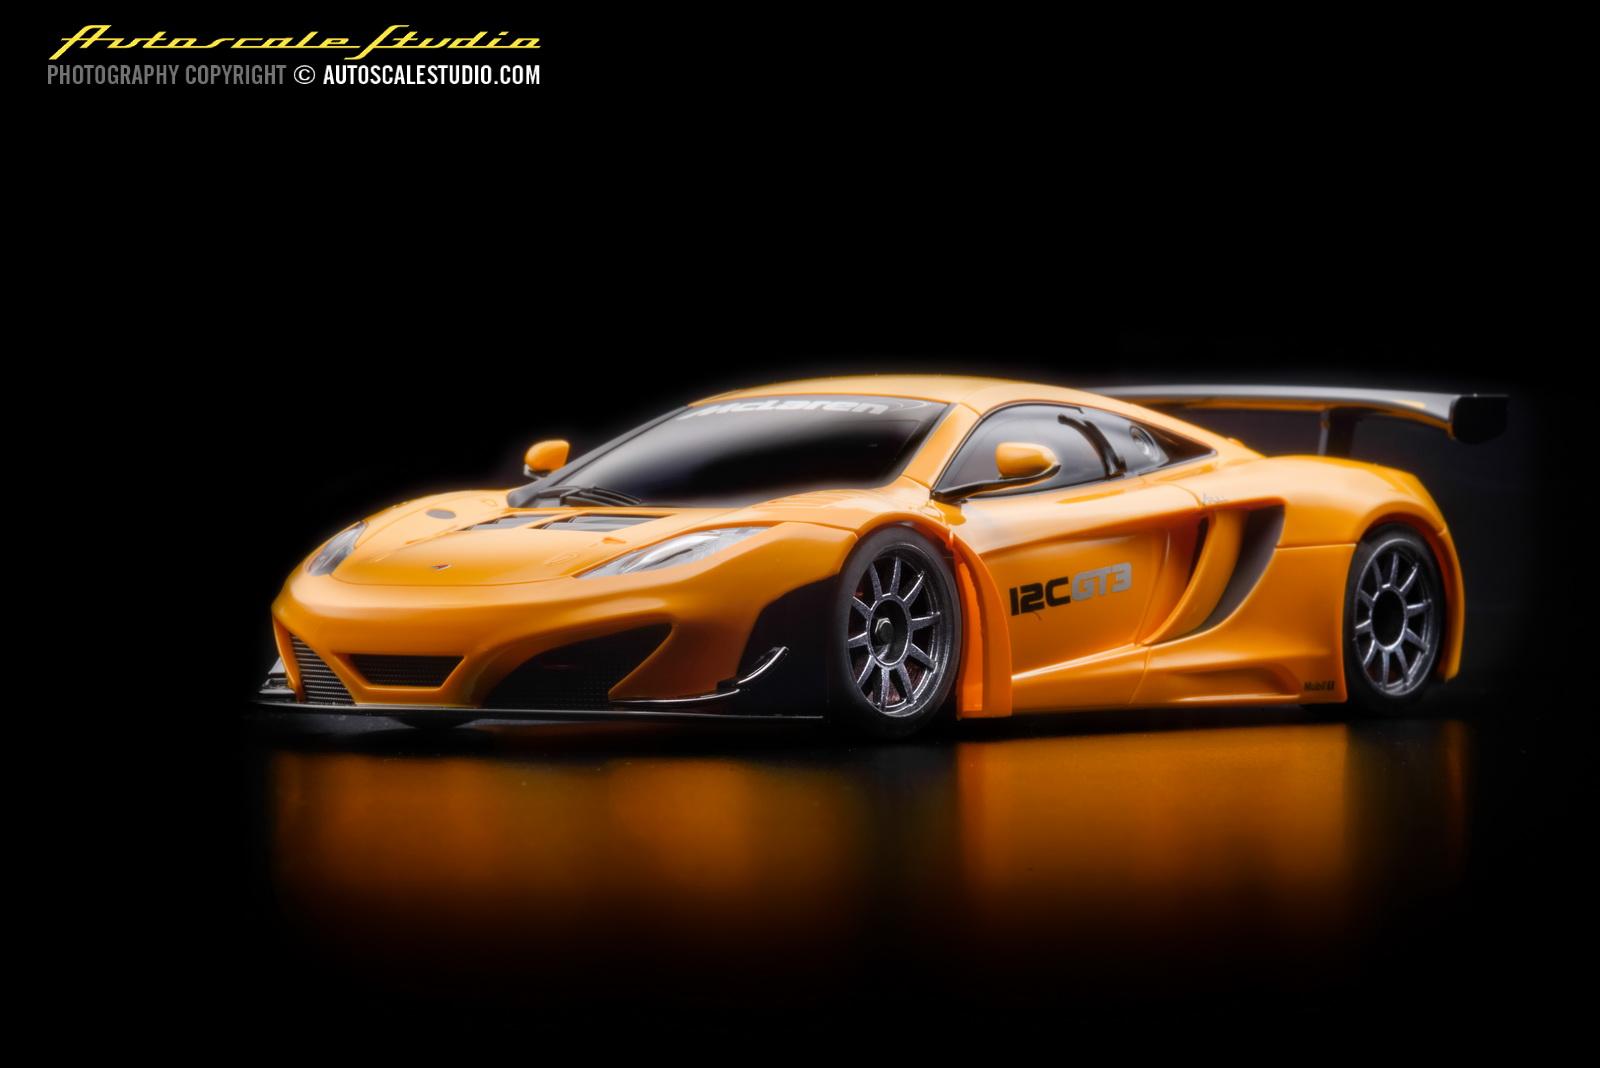 mzp226or mclaren 12c gt3 2013 orange | autoscale studio オート